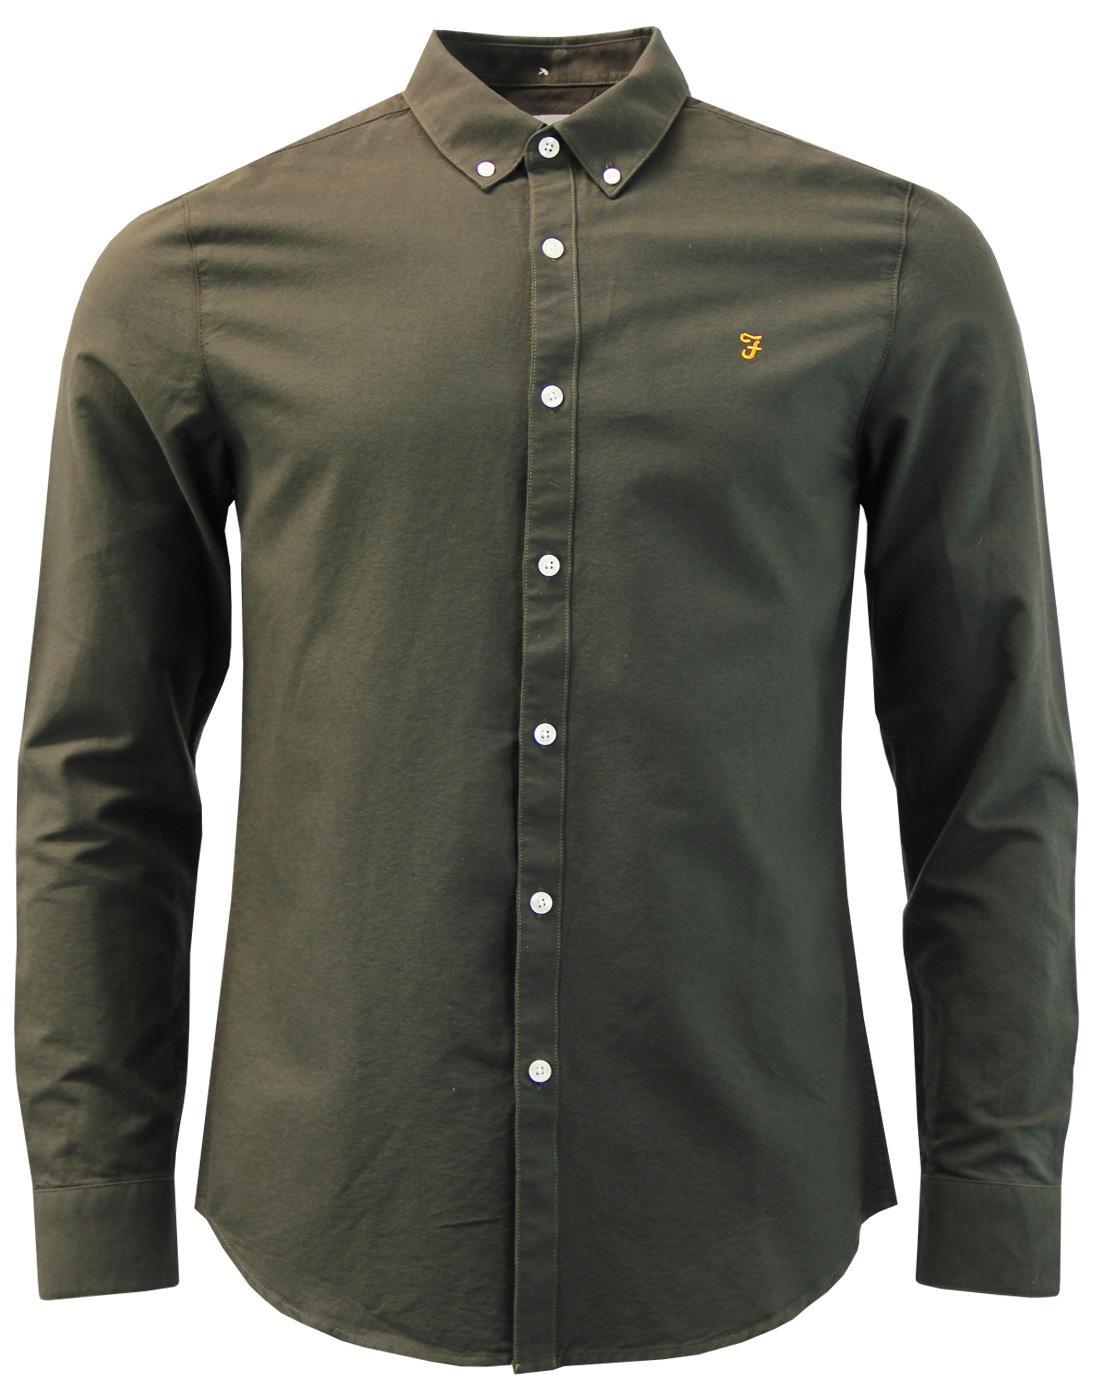 Brewer FARAH Mod Slim Button Down Oxford Shirt EG